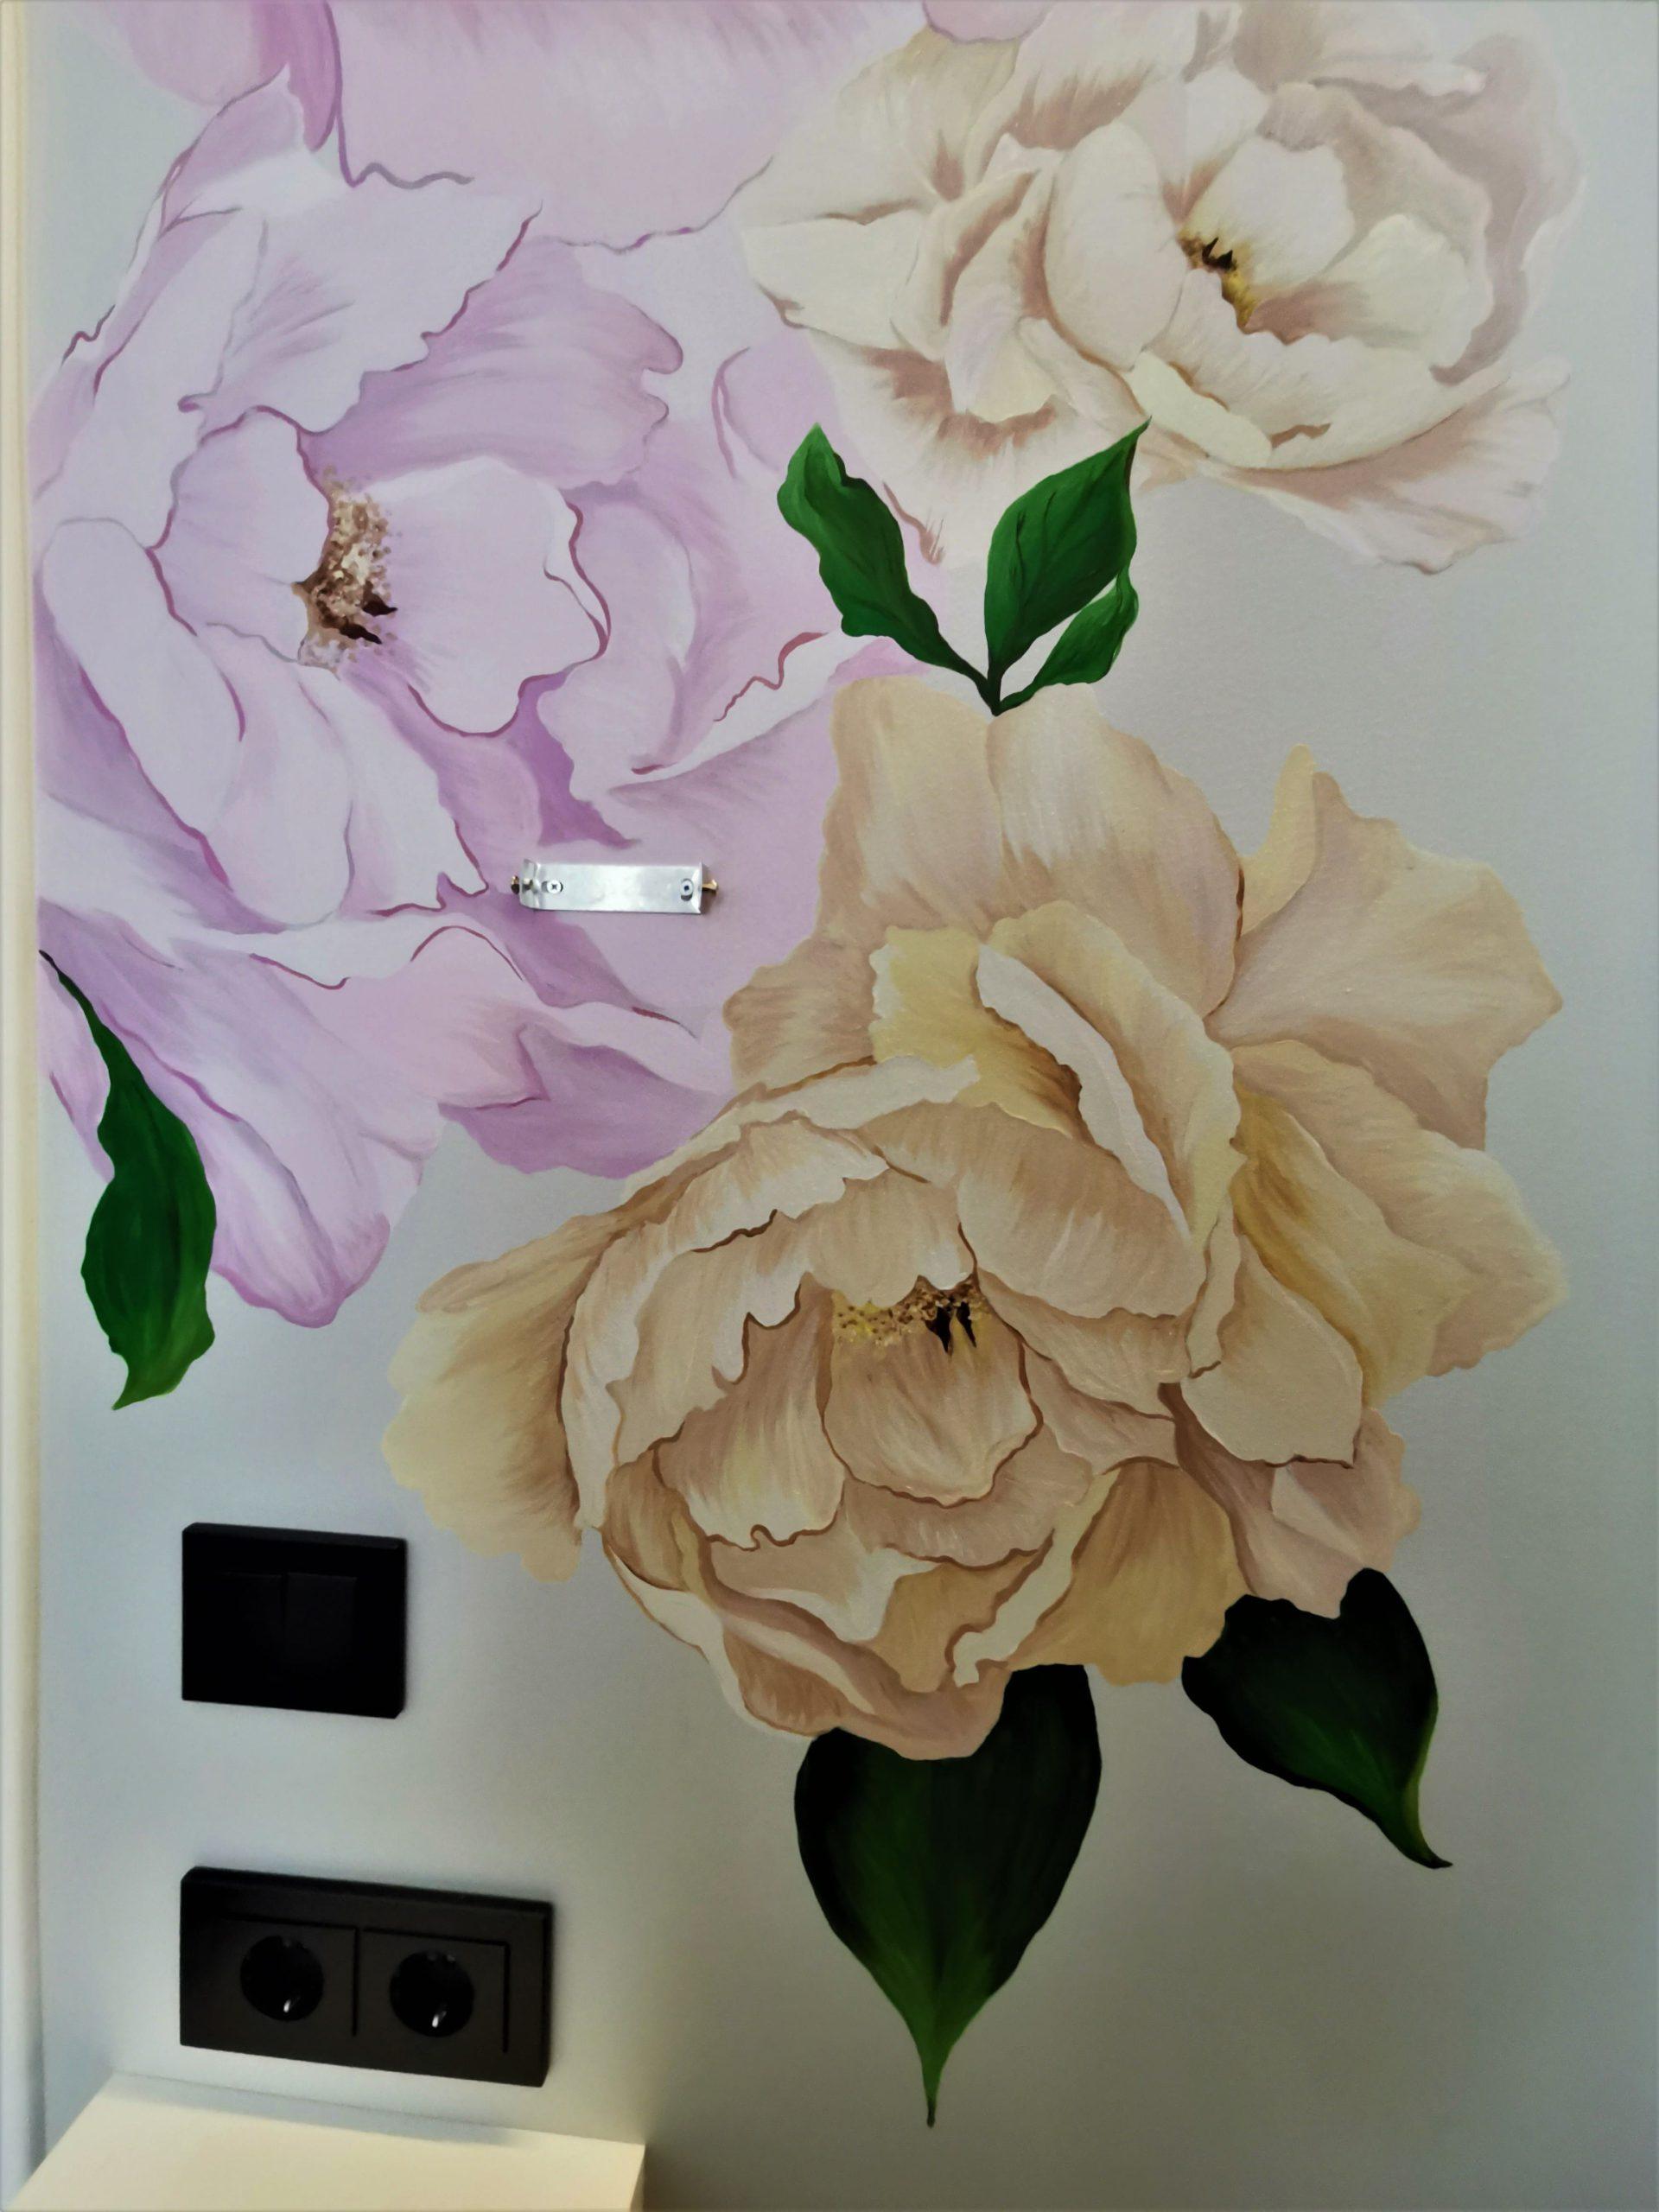 menine-kuryba-sienu-dekoravimas (3)